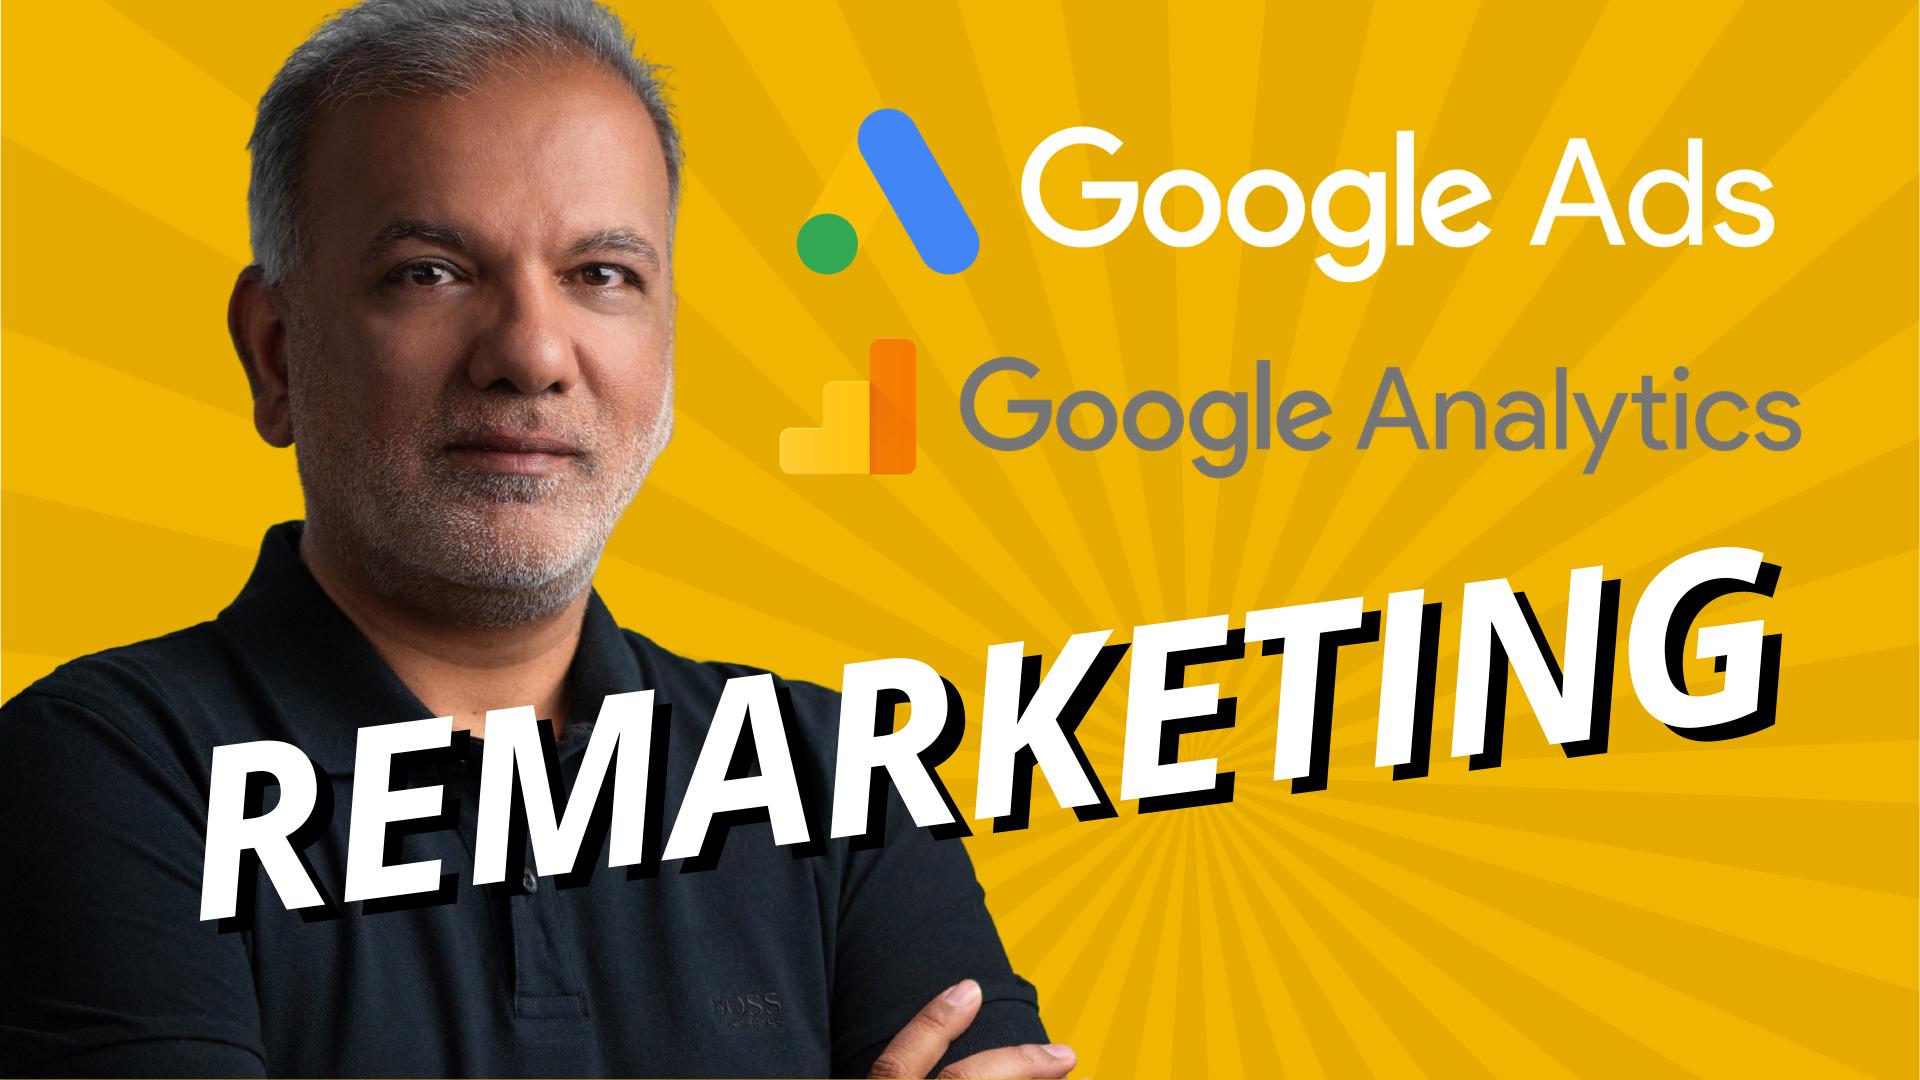 How to Create Remarketing List in Google Analytics